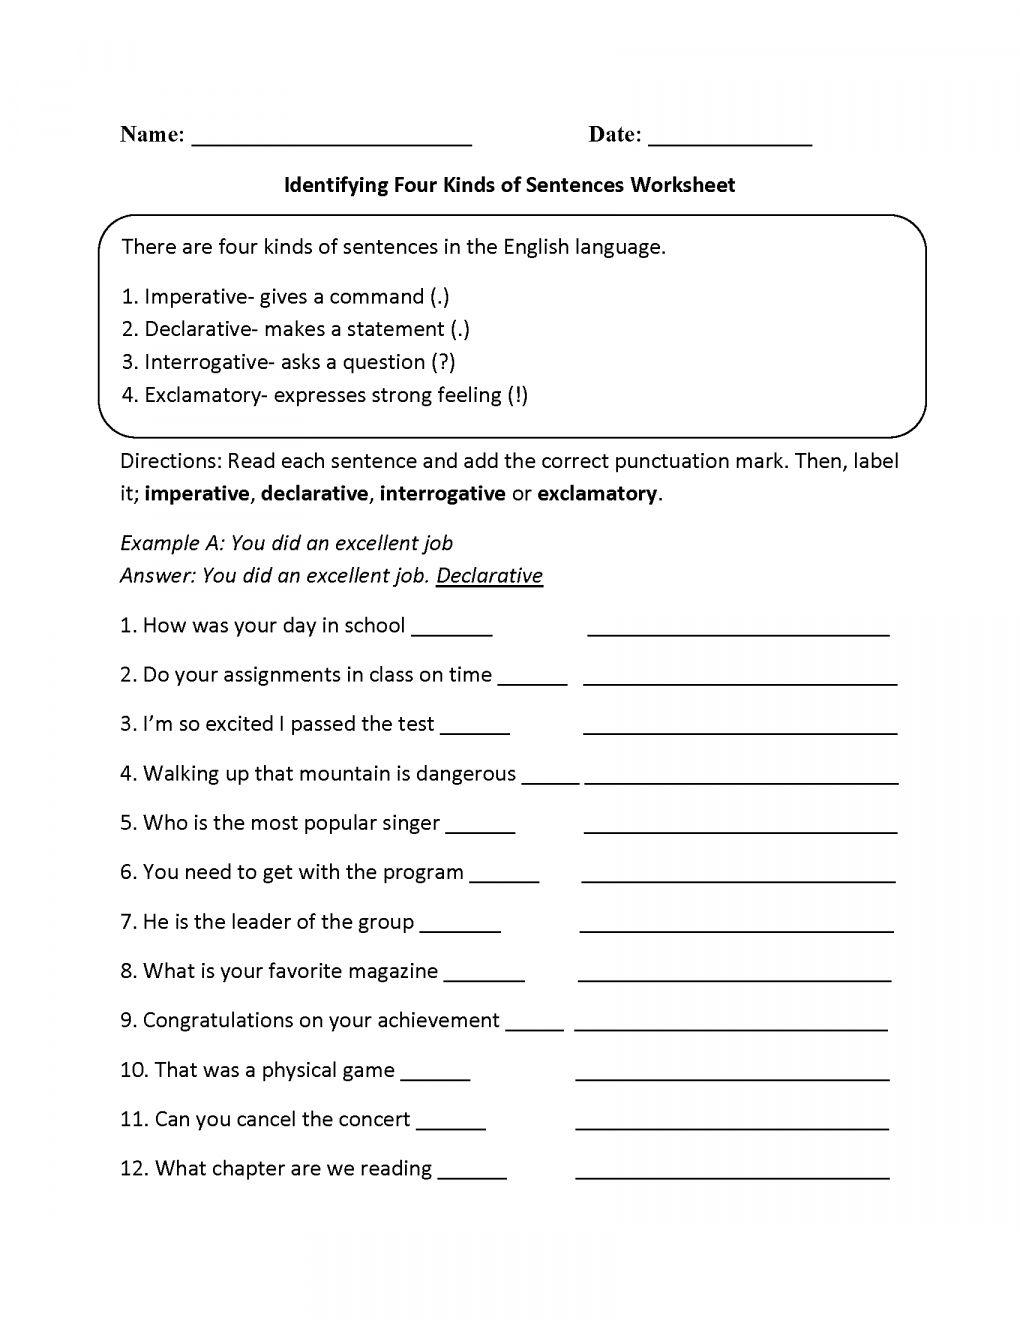 11 6th Grade Types Of Sentences Worksheet Types Of Sentences Worksheet Complex Sentences Worksheets Types Of Sentences